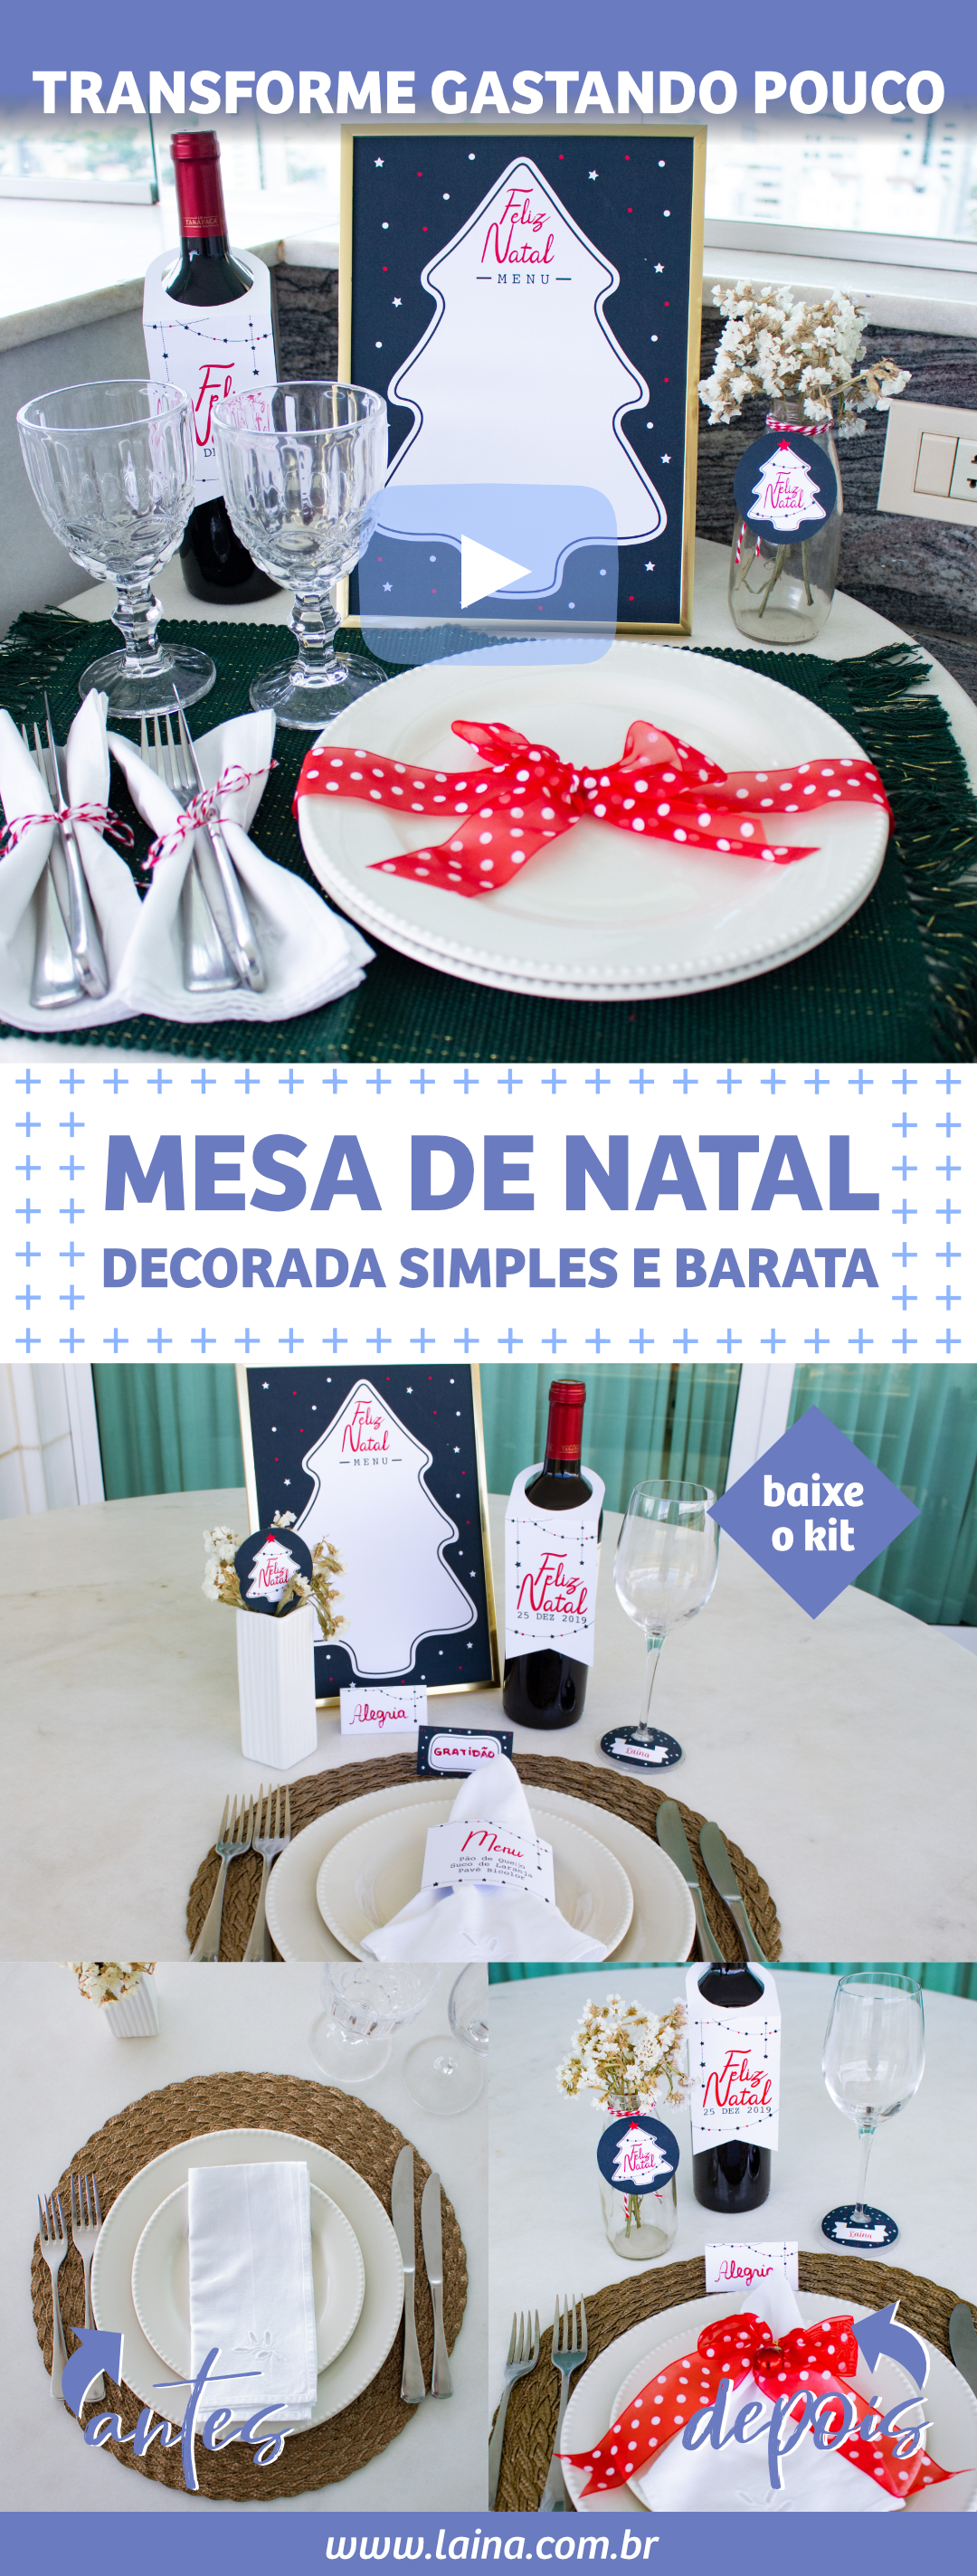 5 ideias de mesa de Natal decorada simples e barata